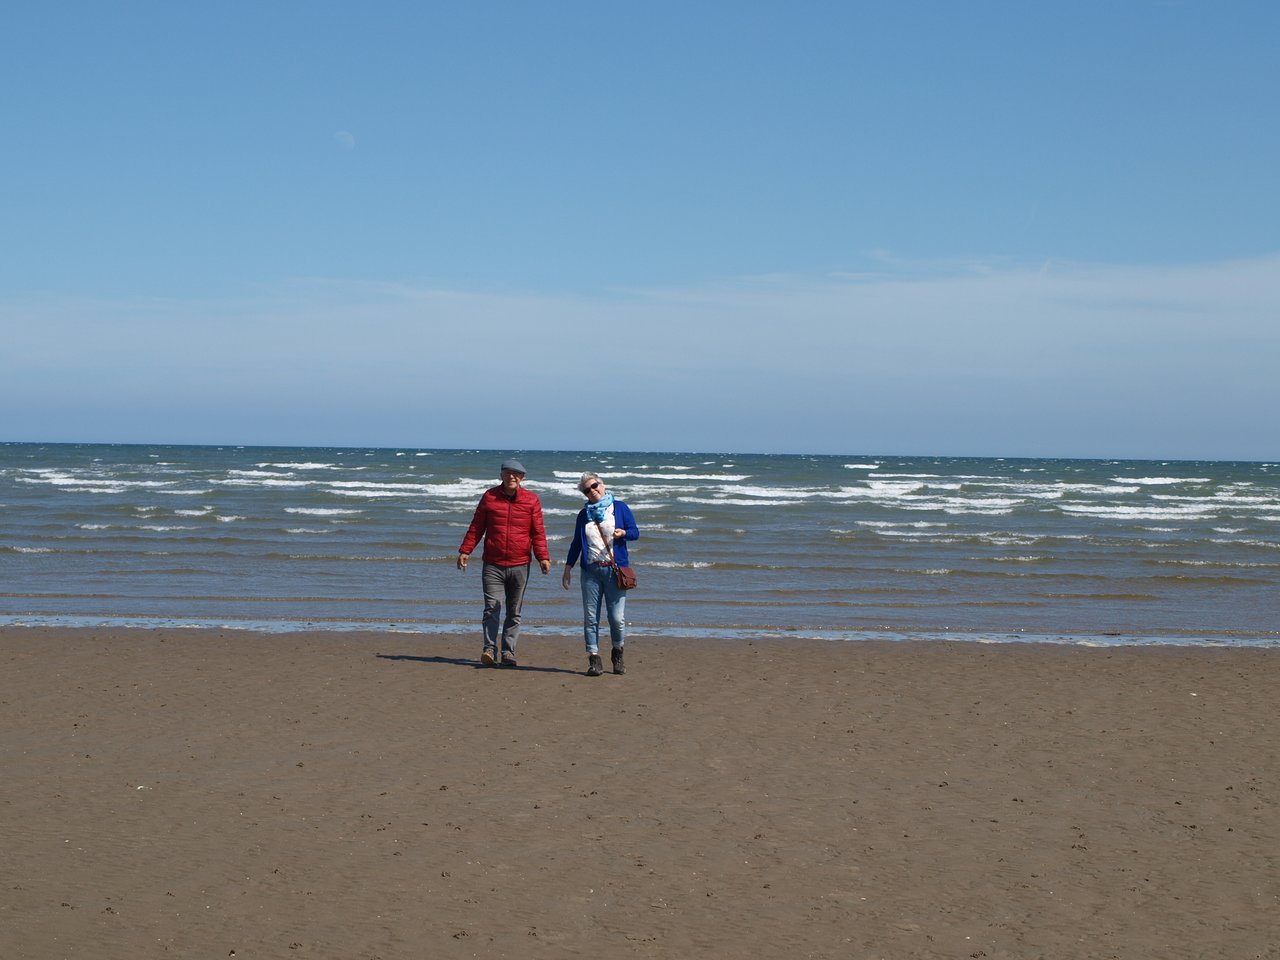 Coasts & Beaches | sil0.co.uk